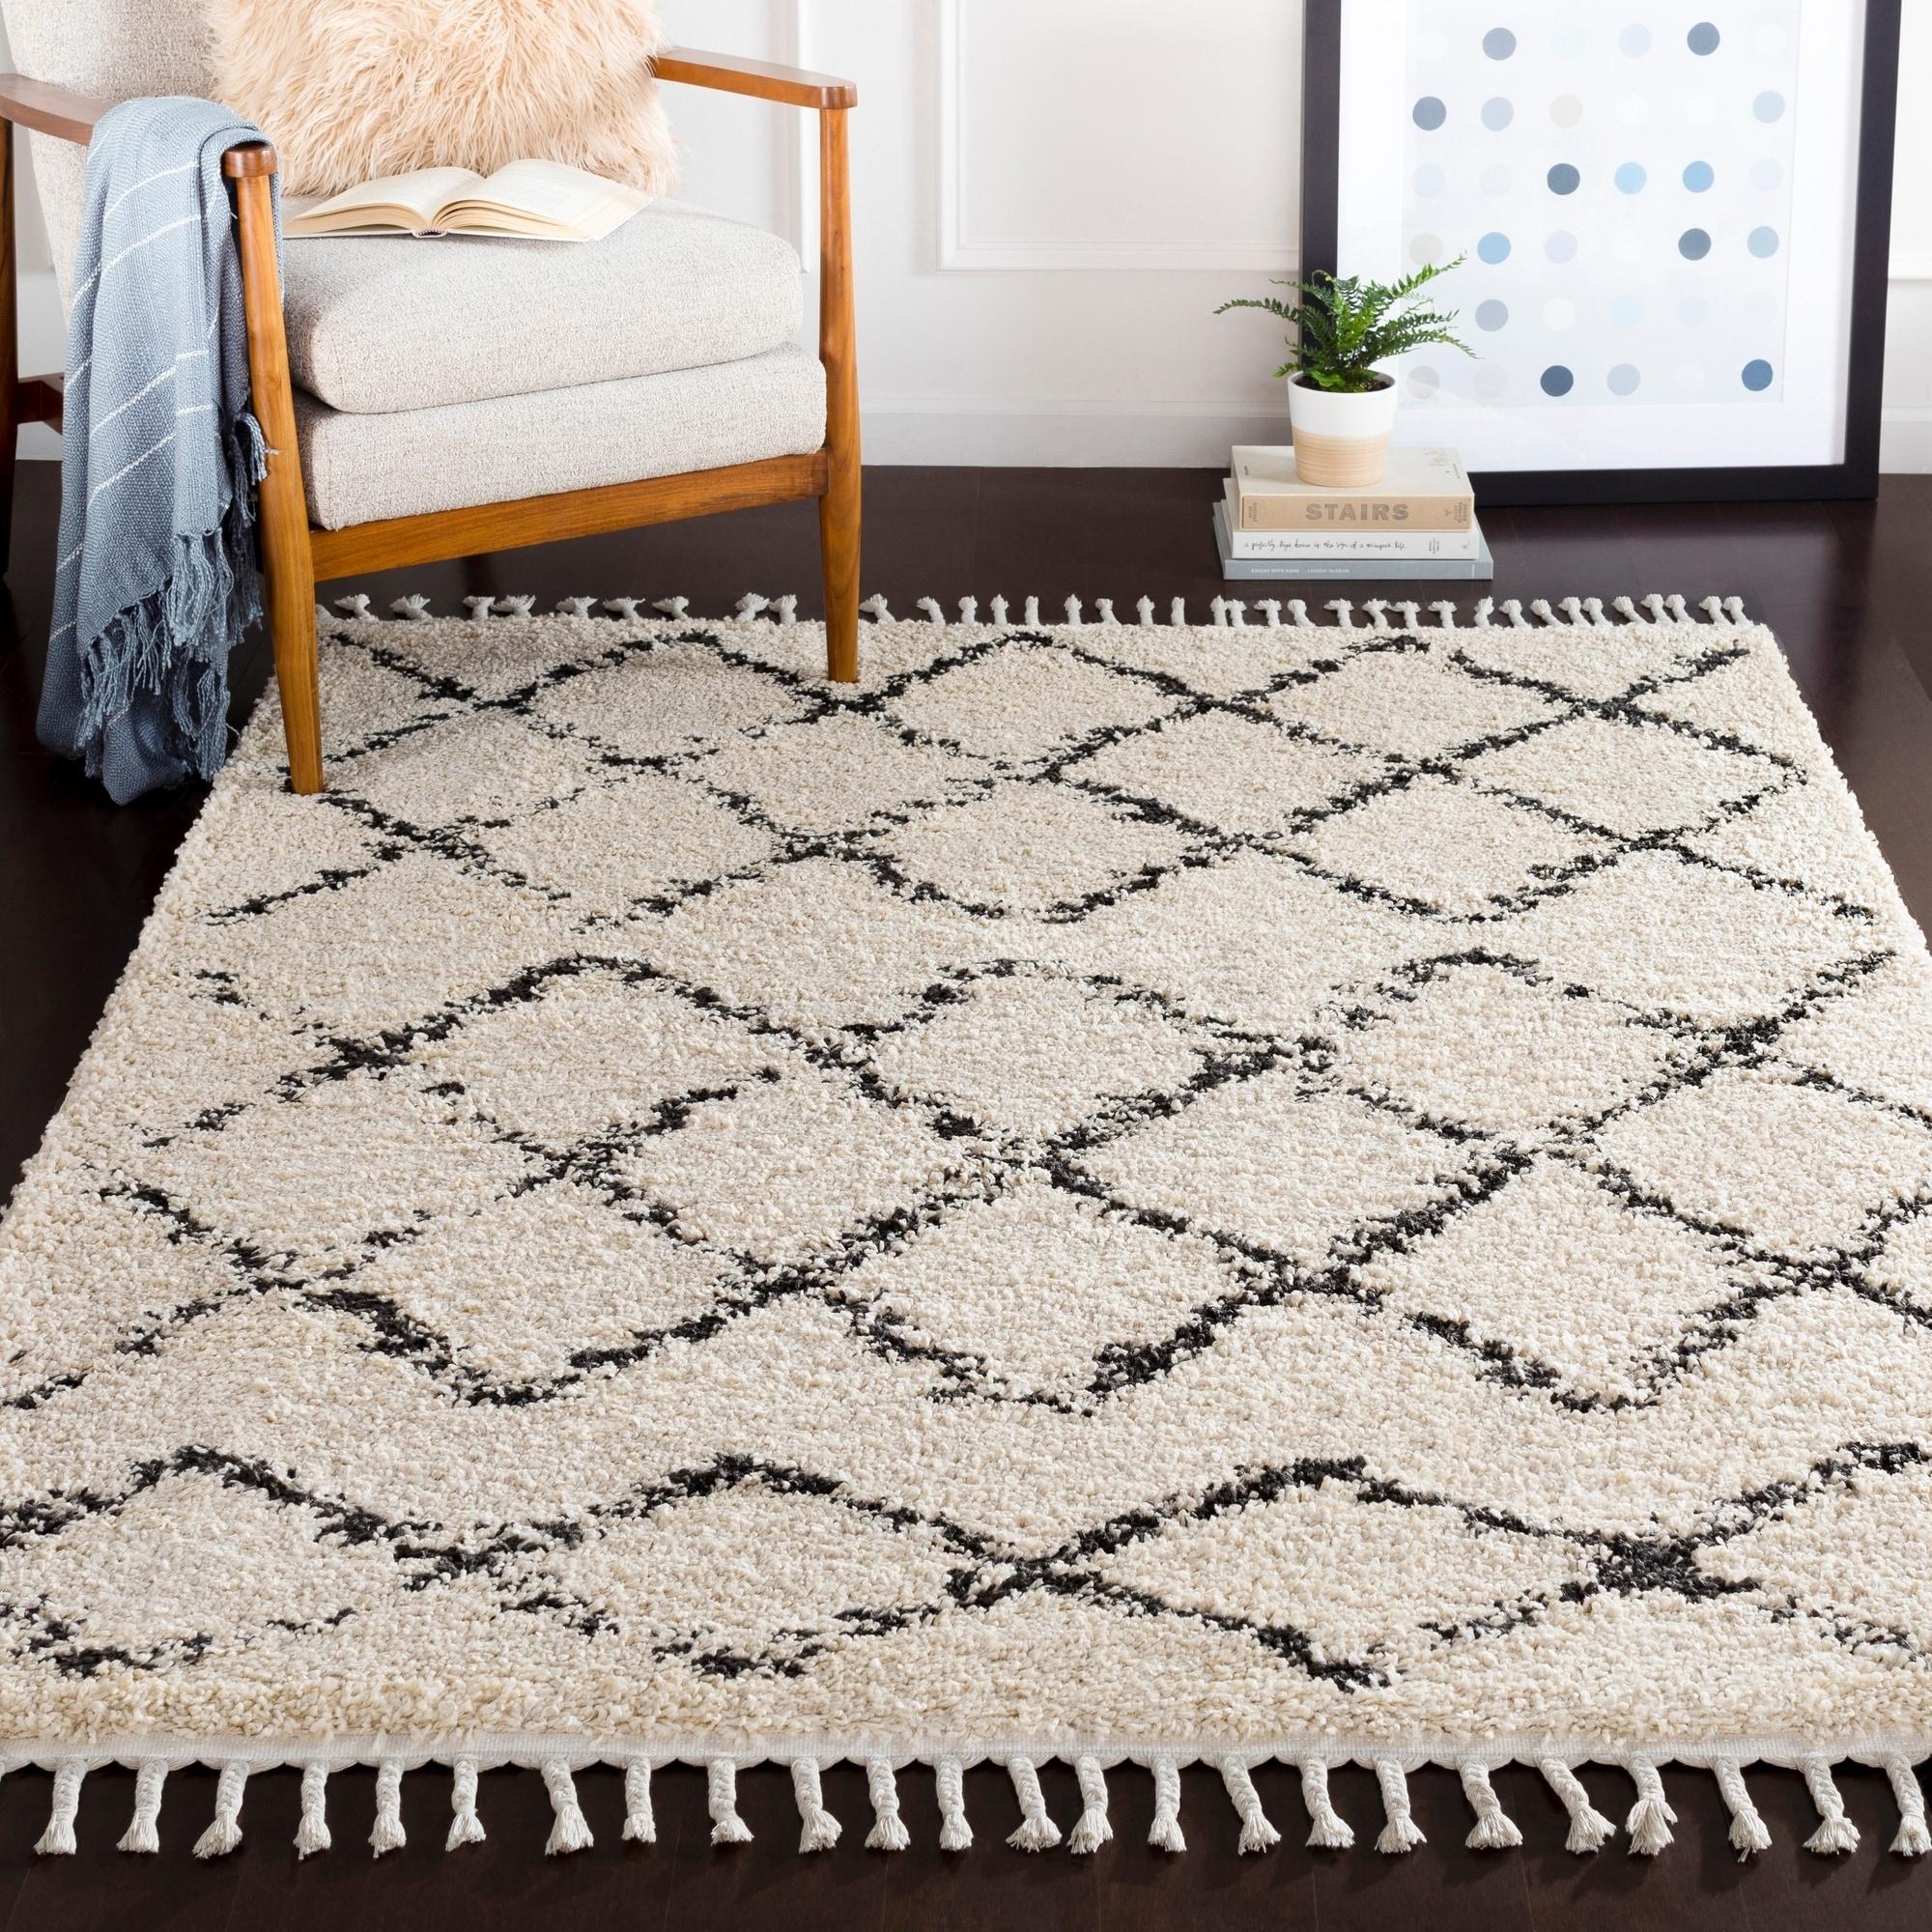 Patterned Area Rugs Amazing Decorating Ideas